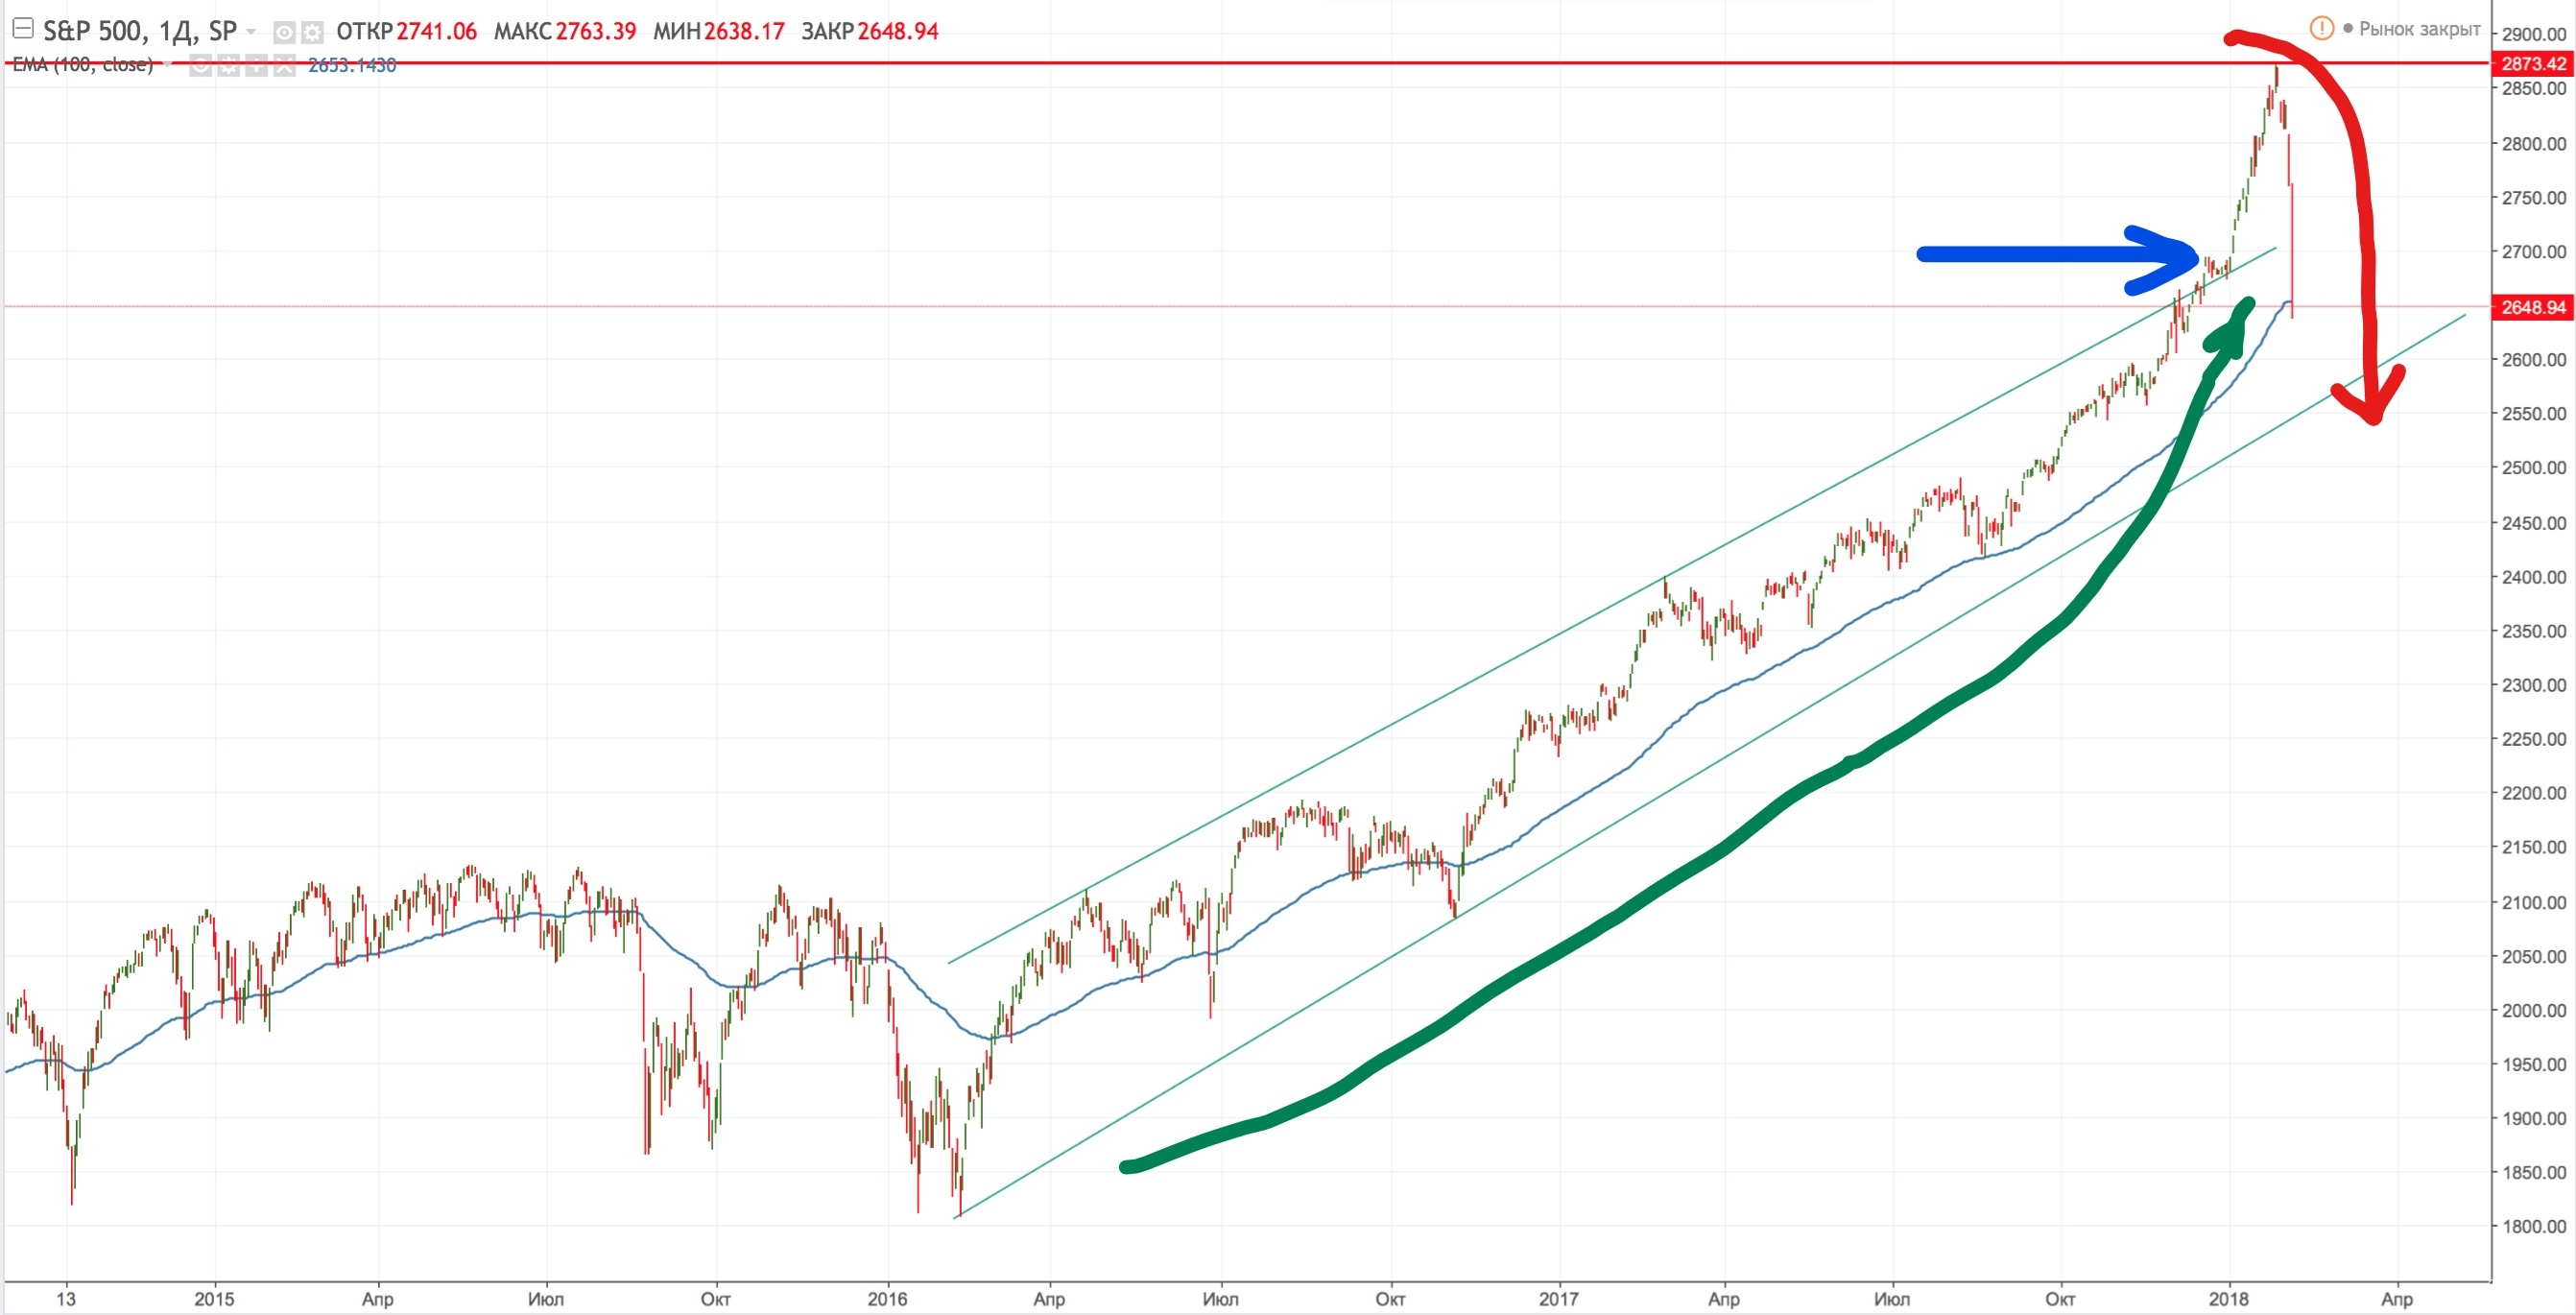 S&P500 drop